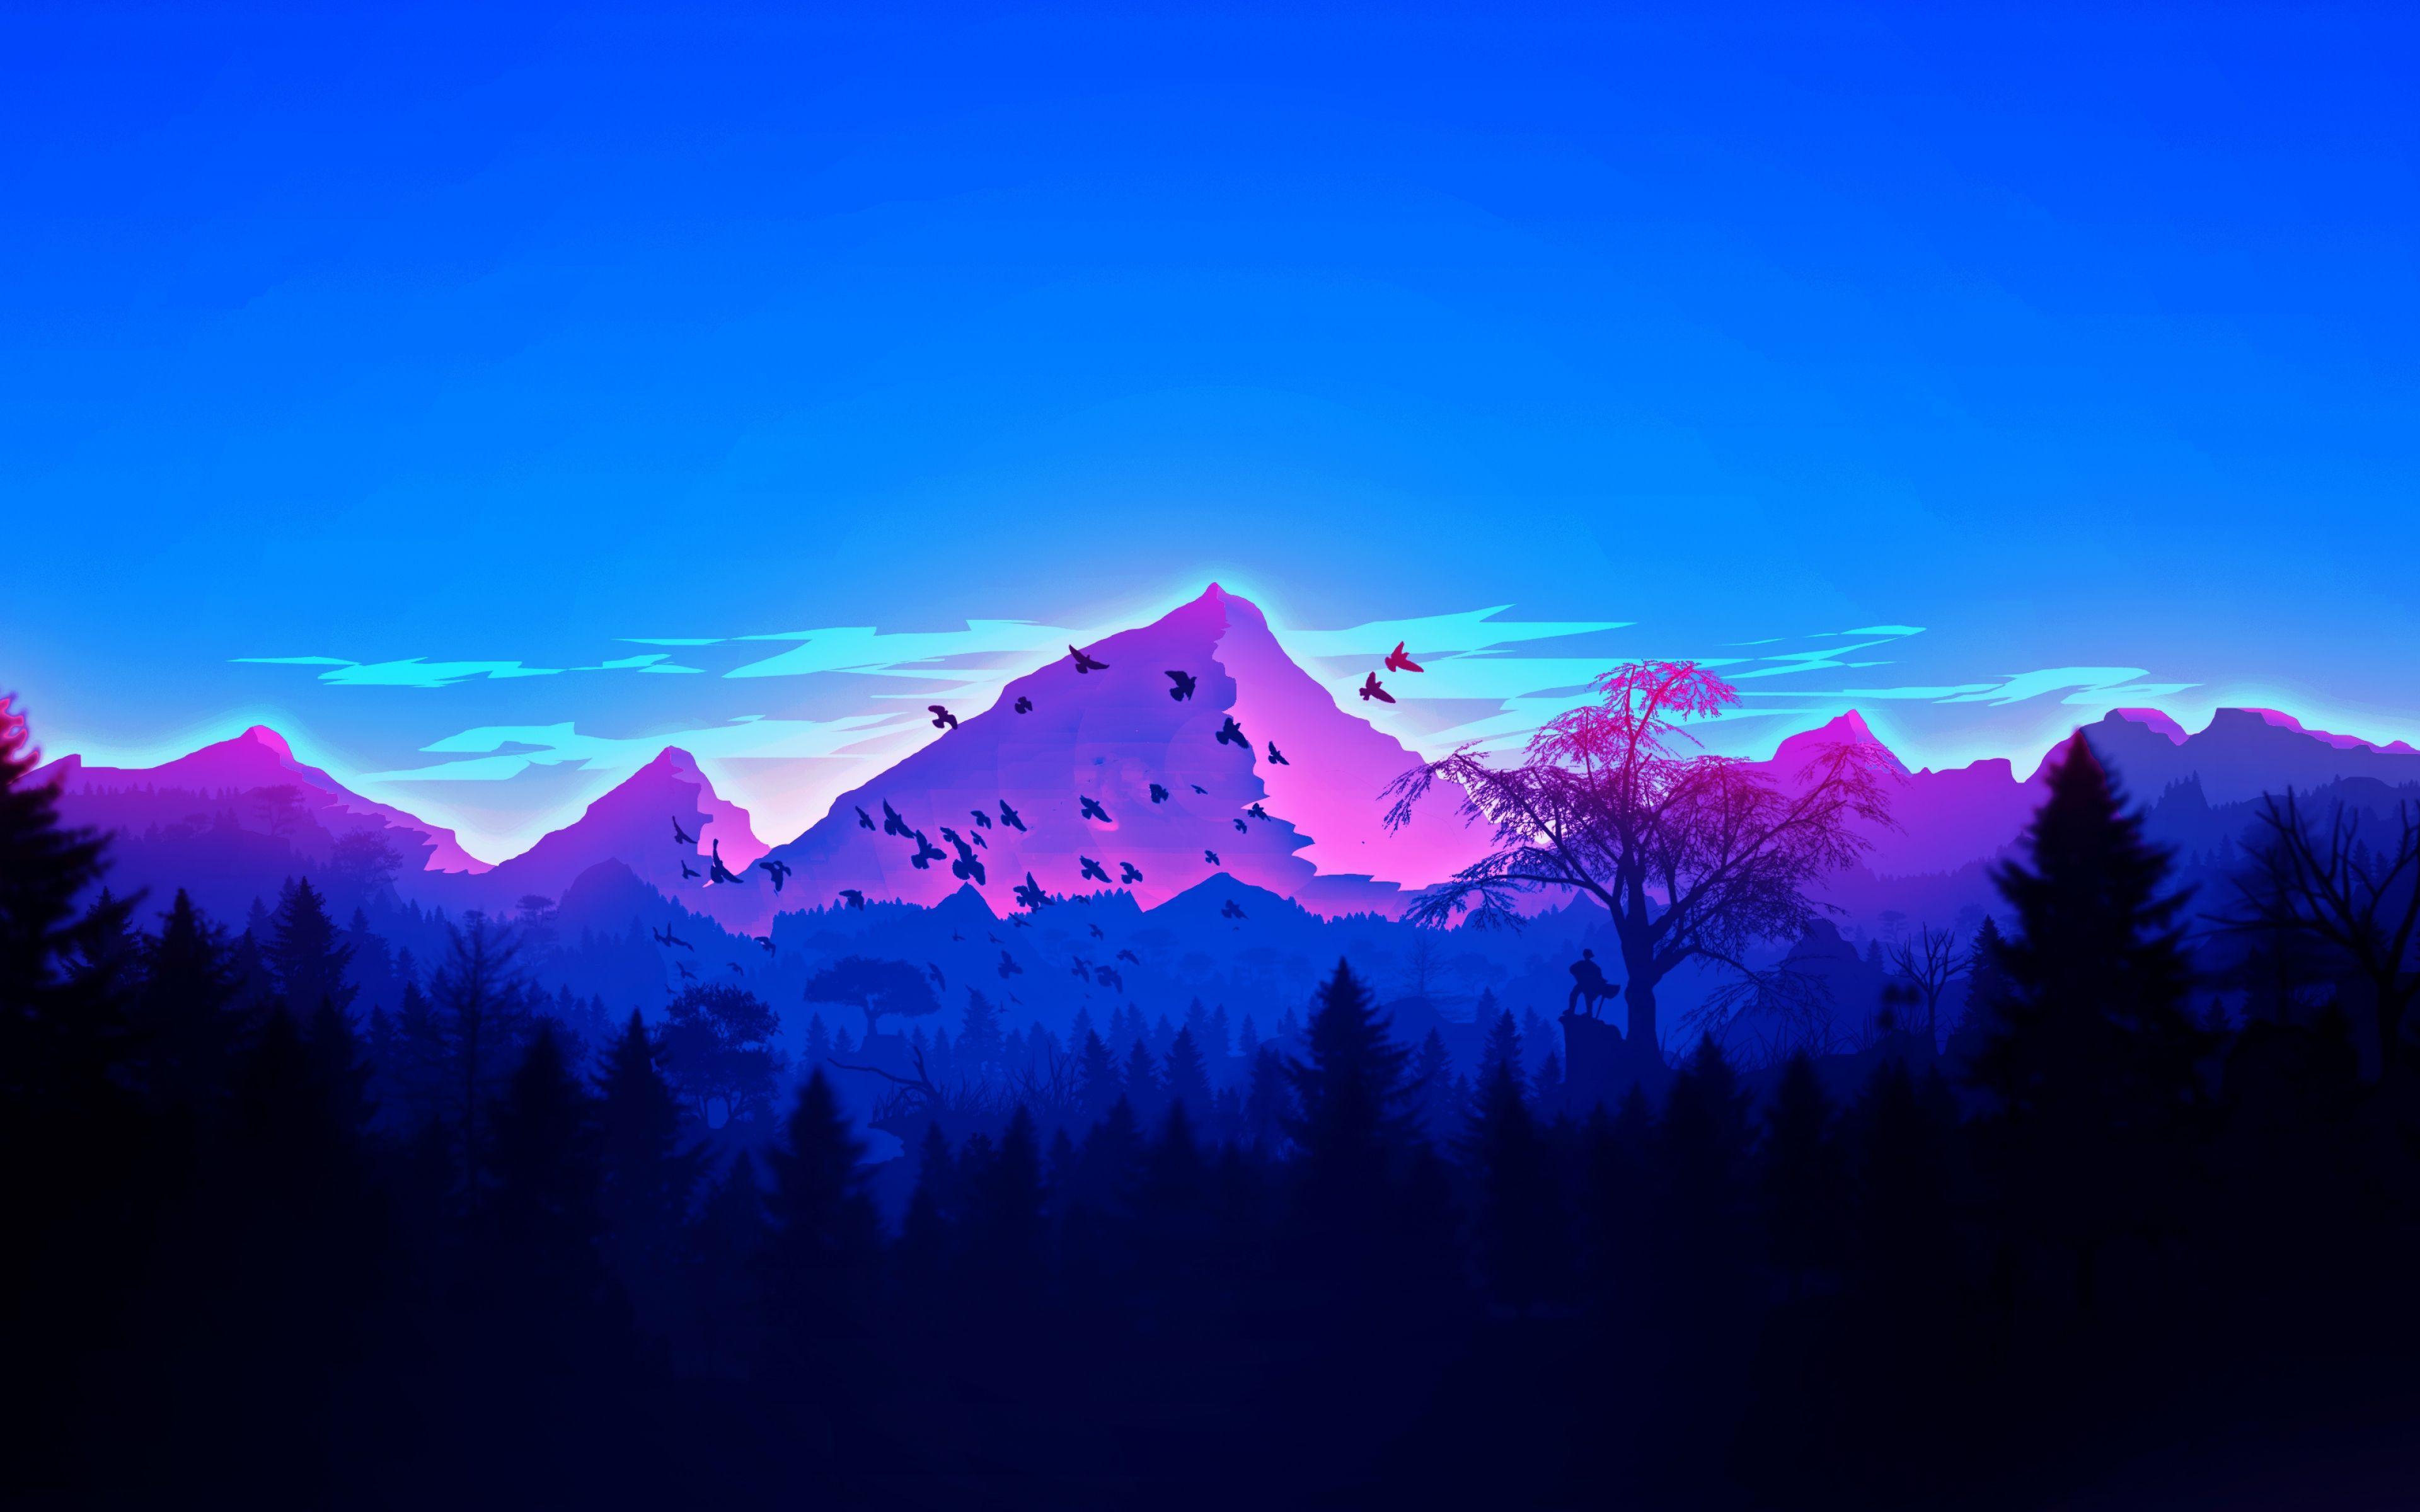 Digital Mountain Wallpapers   Top Free Digital Mountain ...